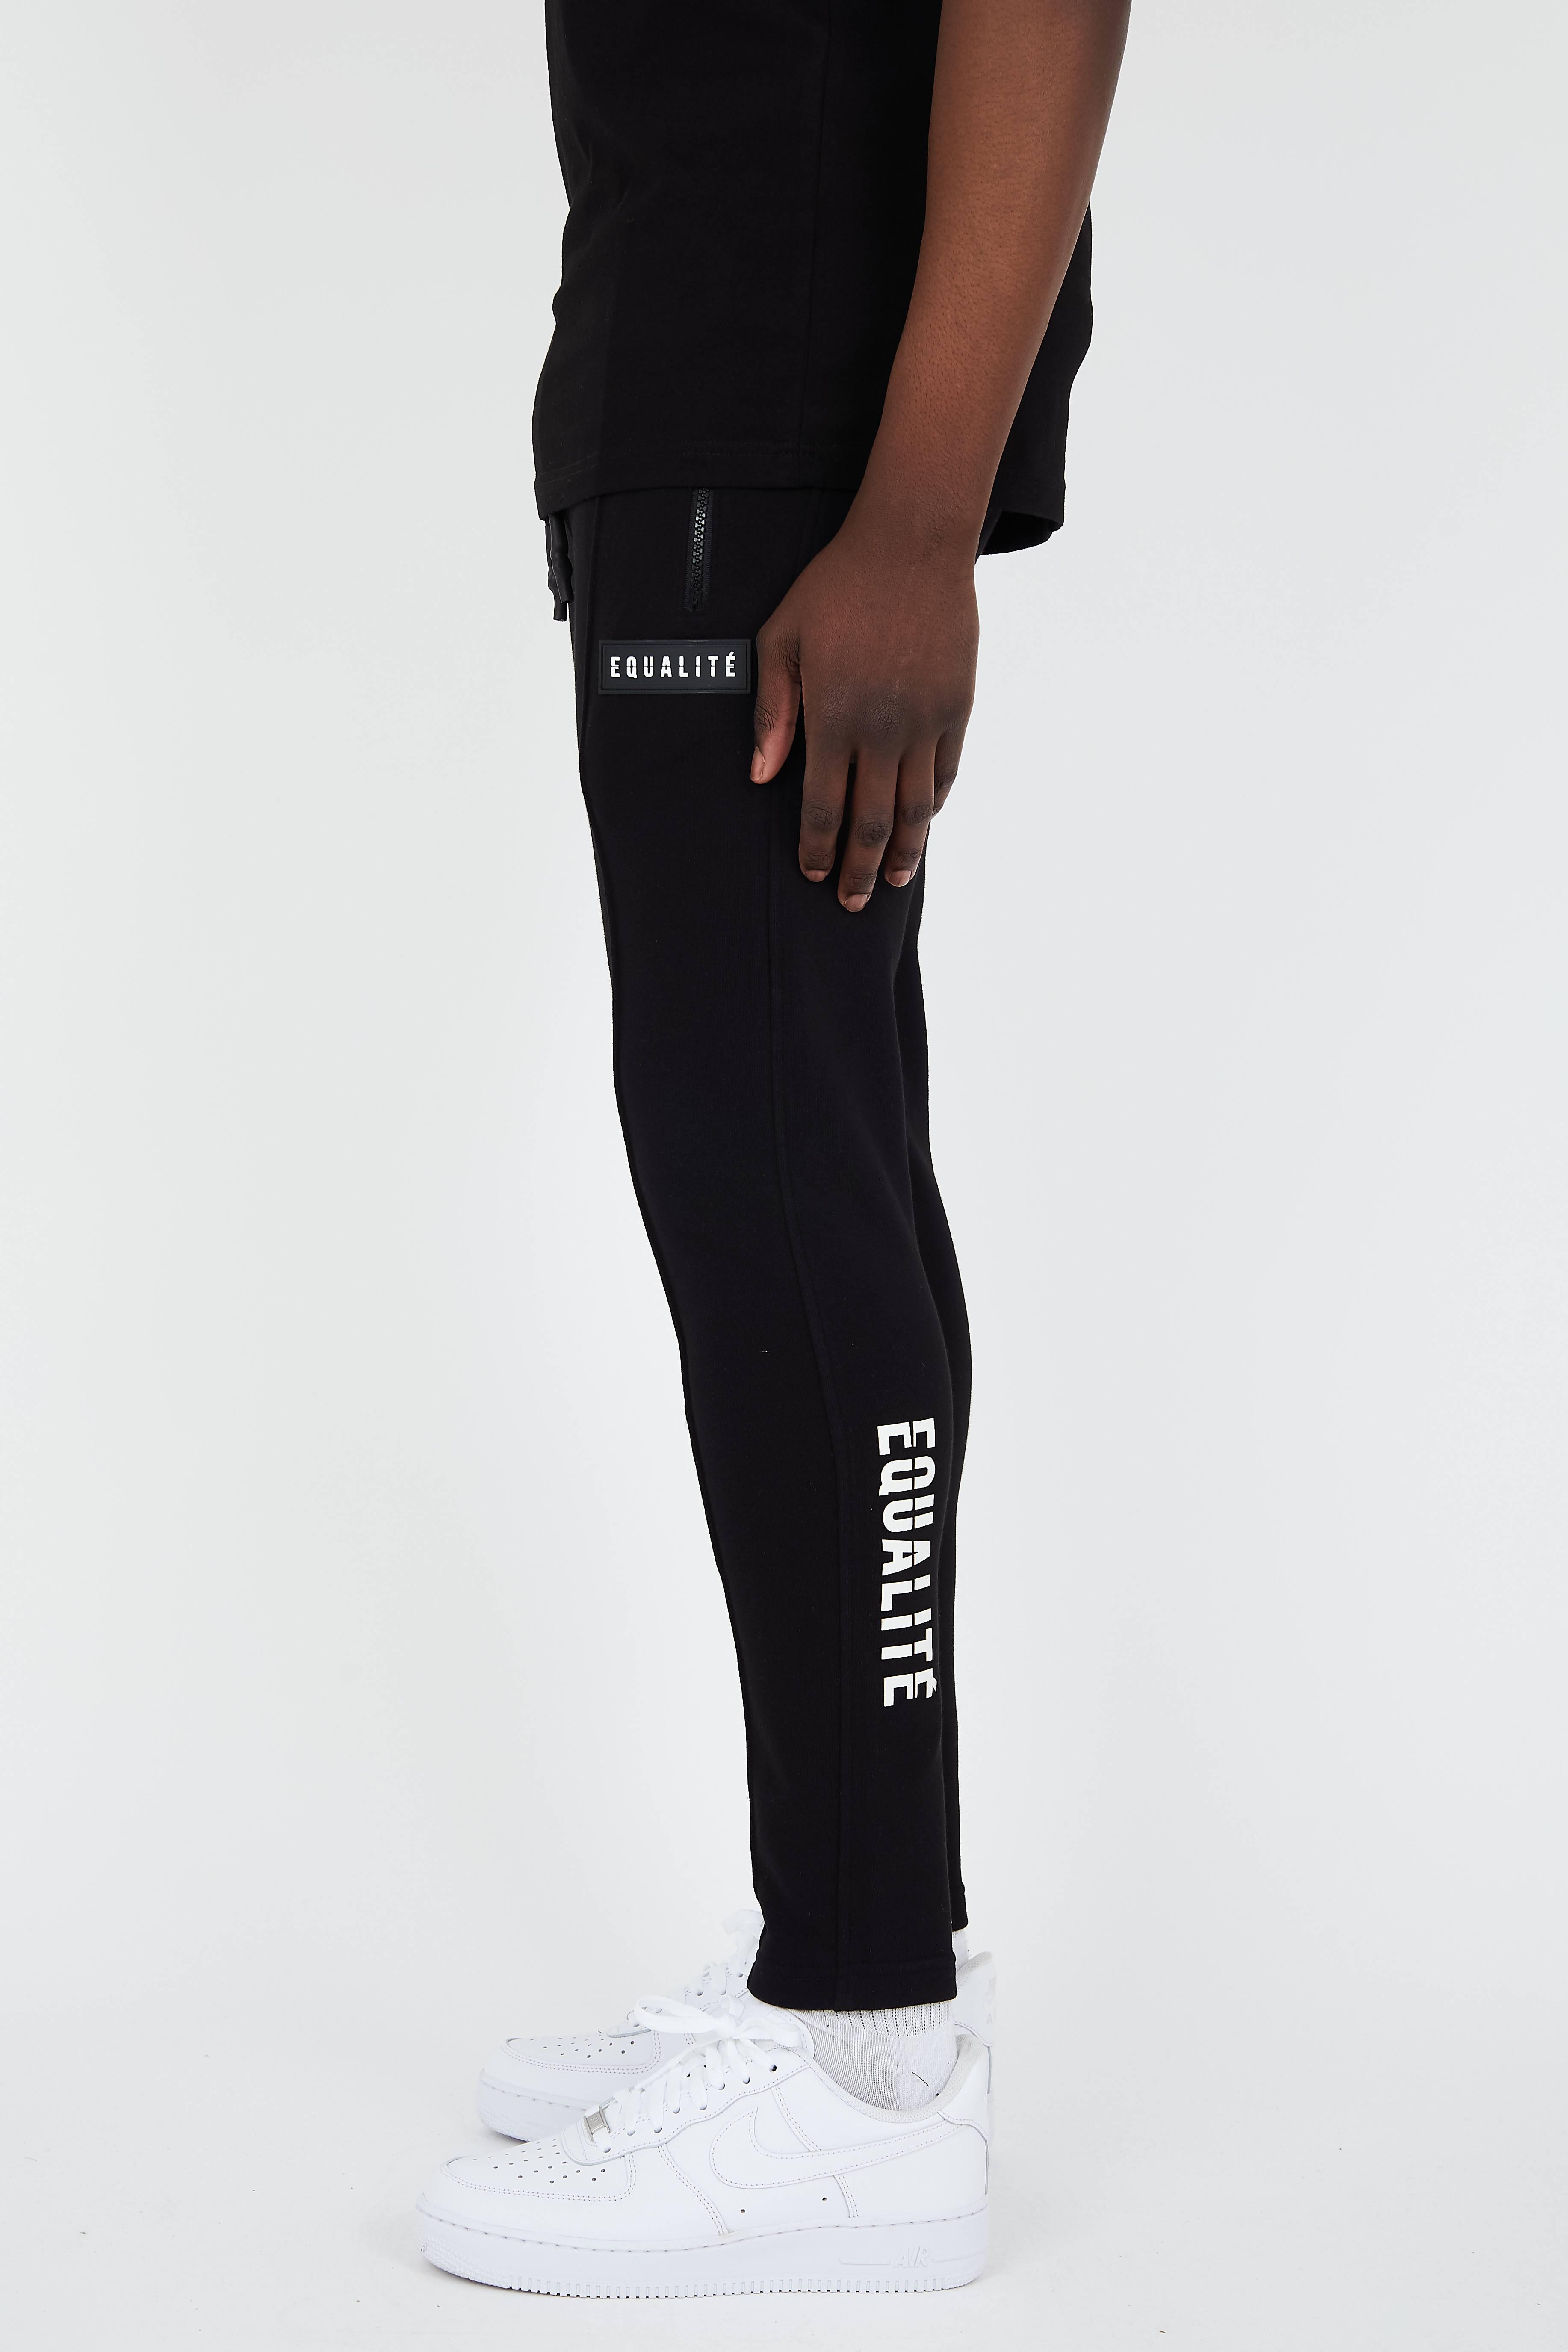 EQUALITÉ TRACK PANTS BLACK-2